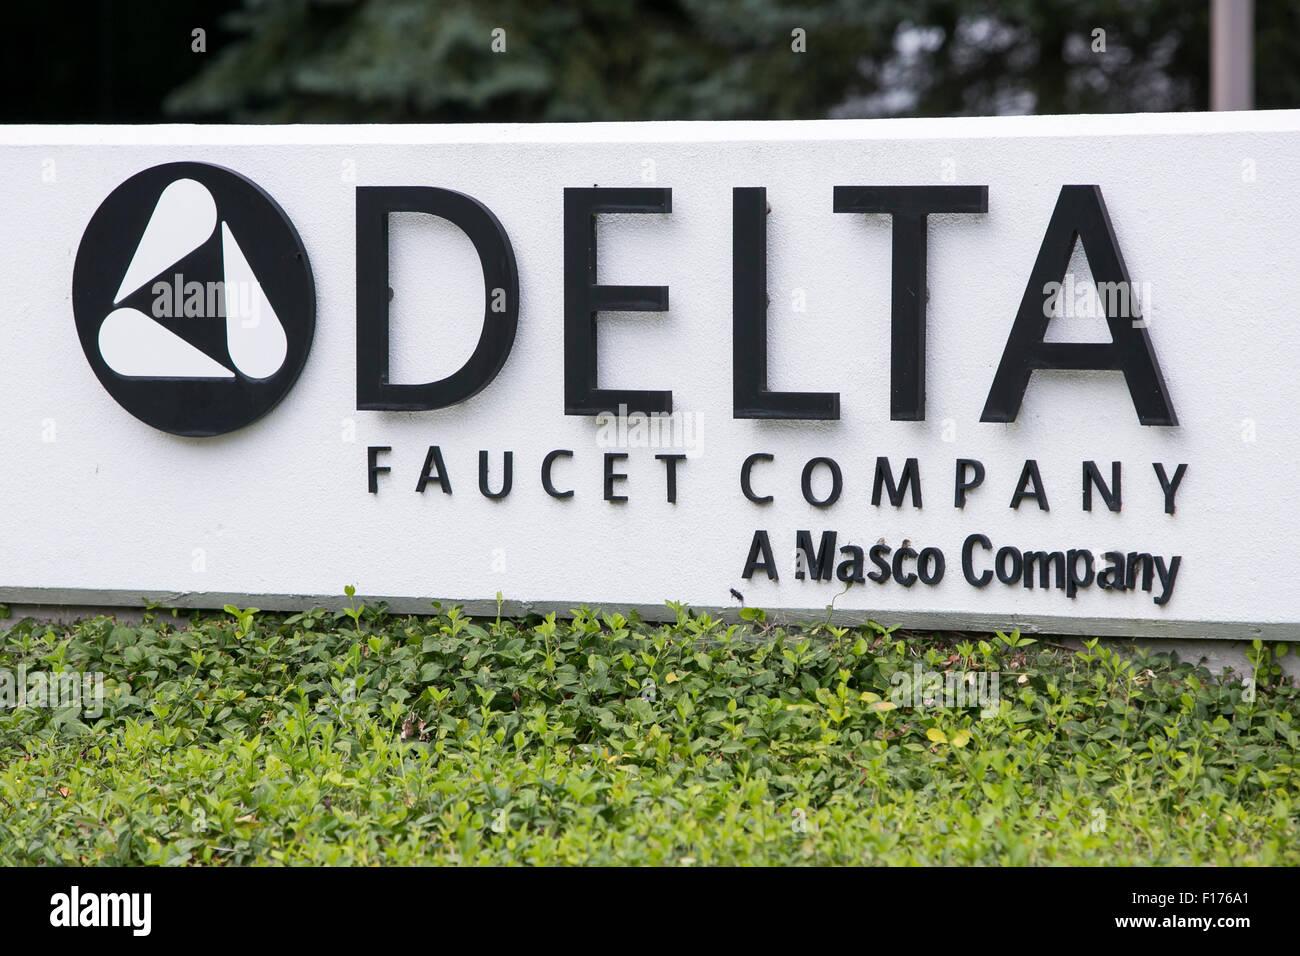 Magnificent Delta Faucet Company Ensign - Faucet Products ...